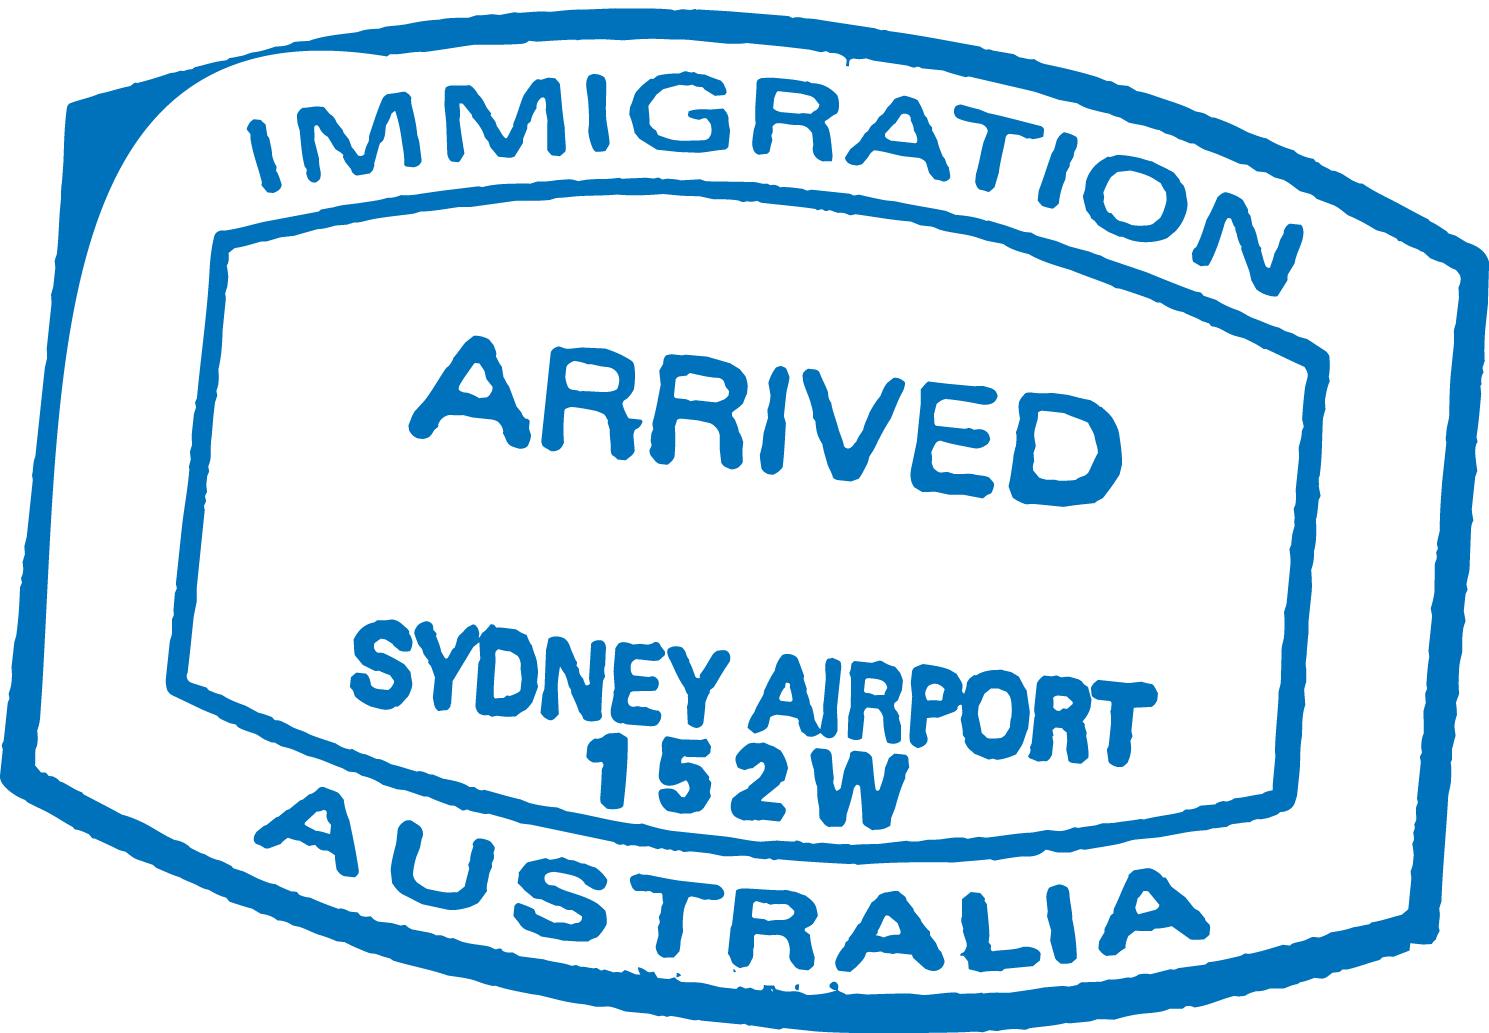 working holiday visa españa, estudiar en australia, australianway.es, estudiaenaustralia.es, trabajar en australia